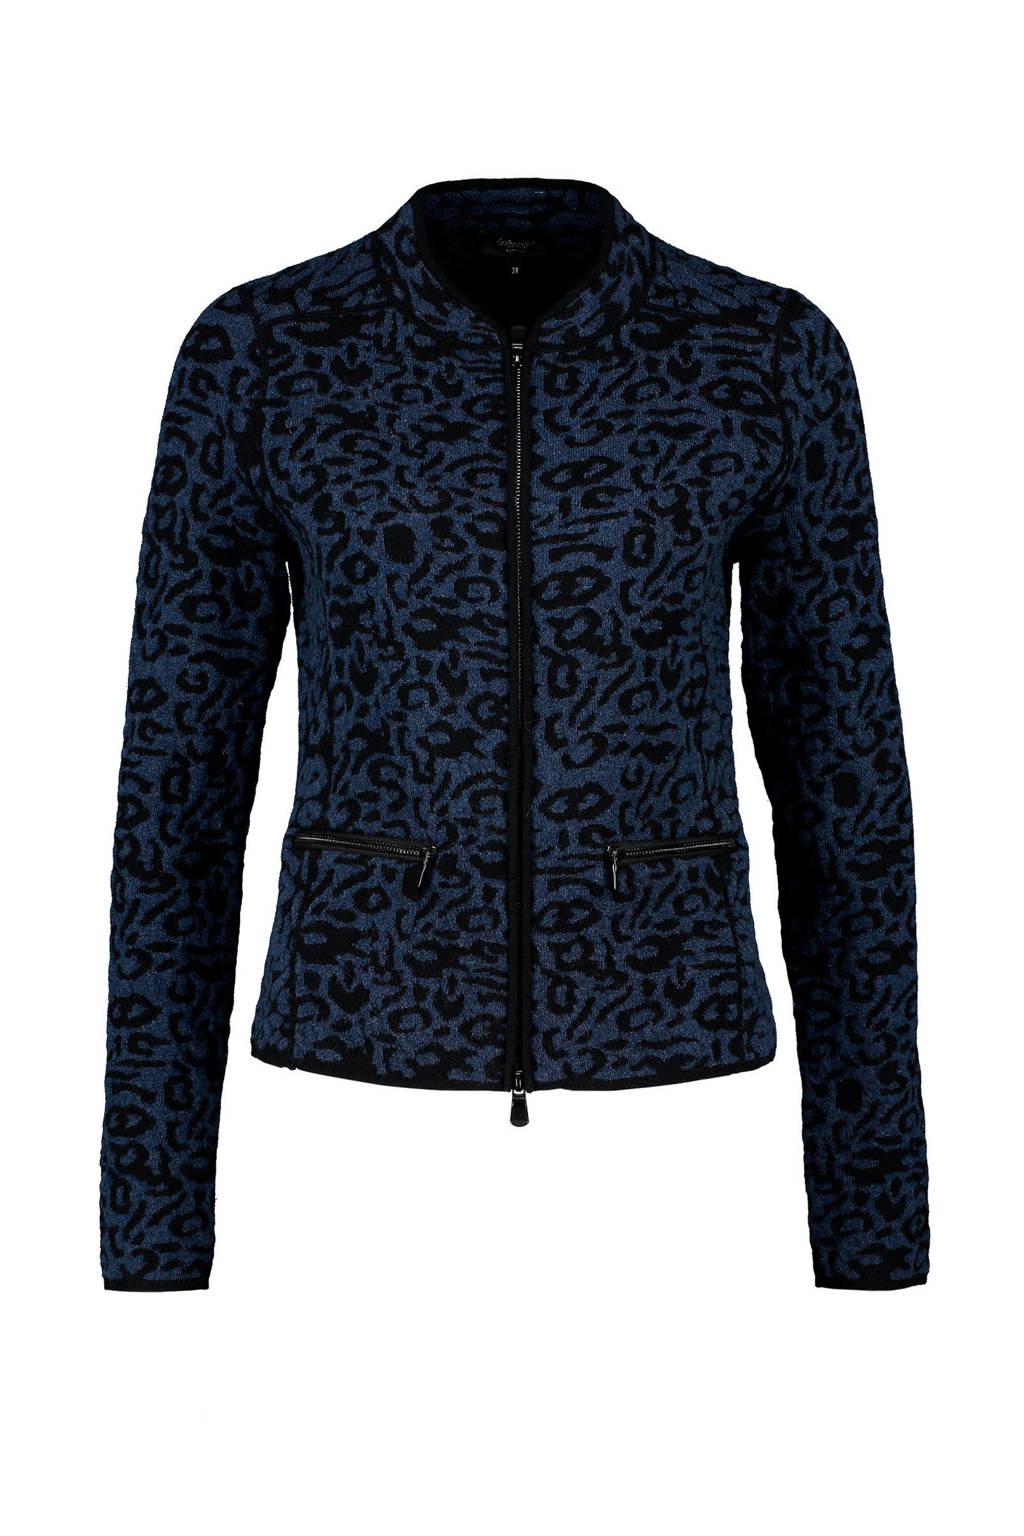 Claudia Sträter jasje met panterprint donkerblauw, Donkerblauw